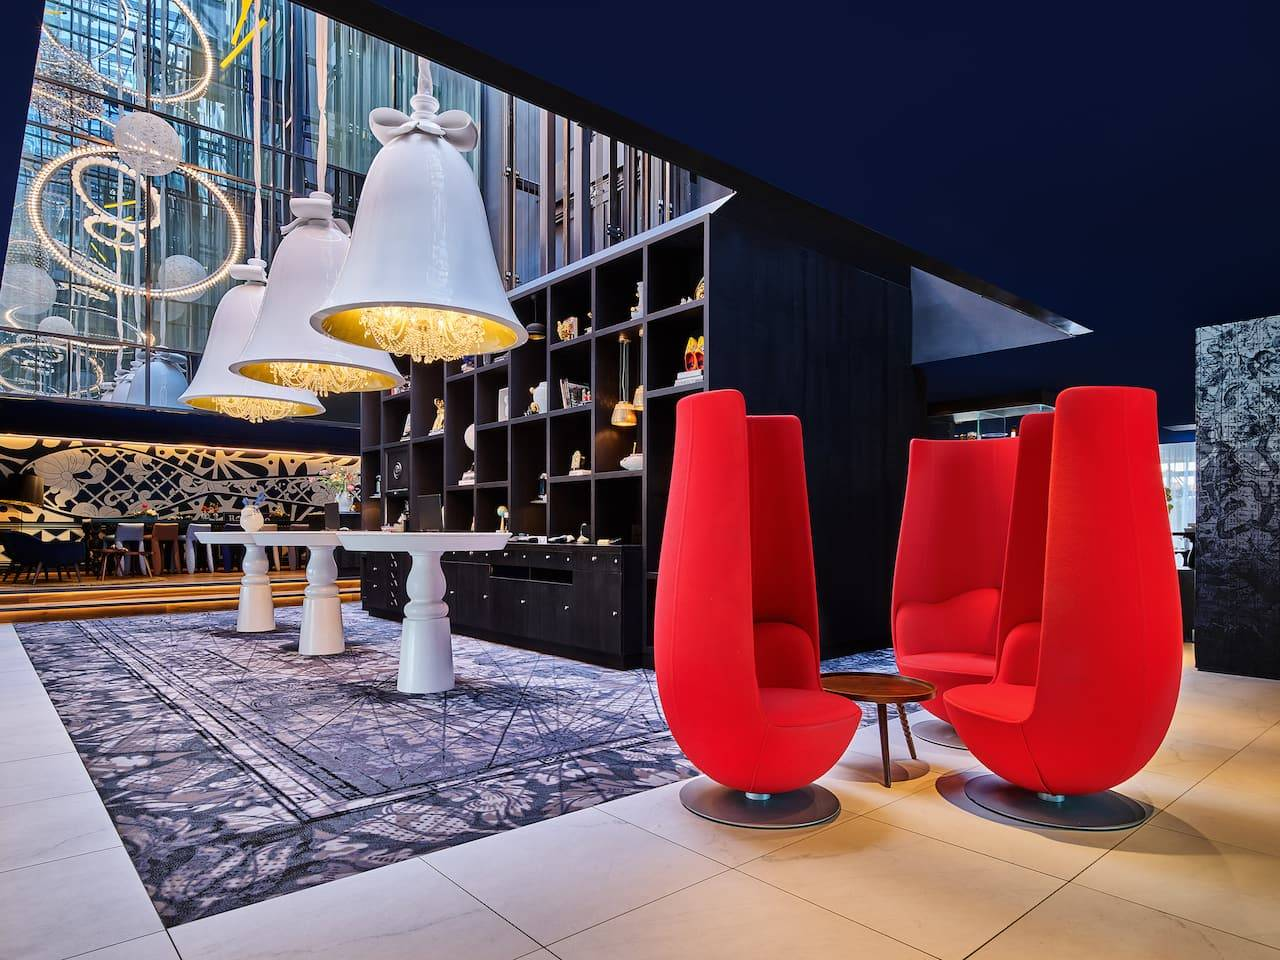 SlatorCon London 2020 venue Andaz London Liverpool Street